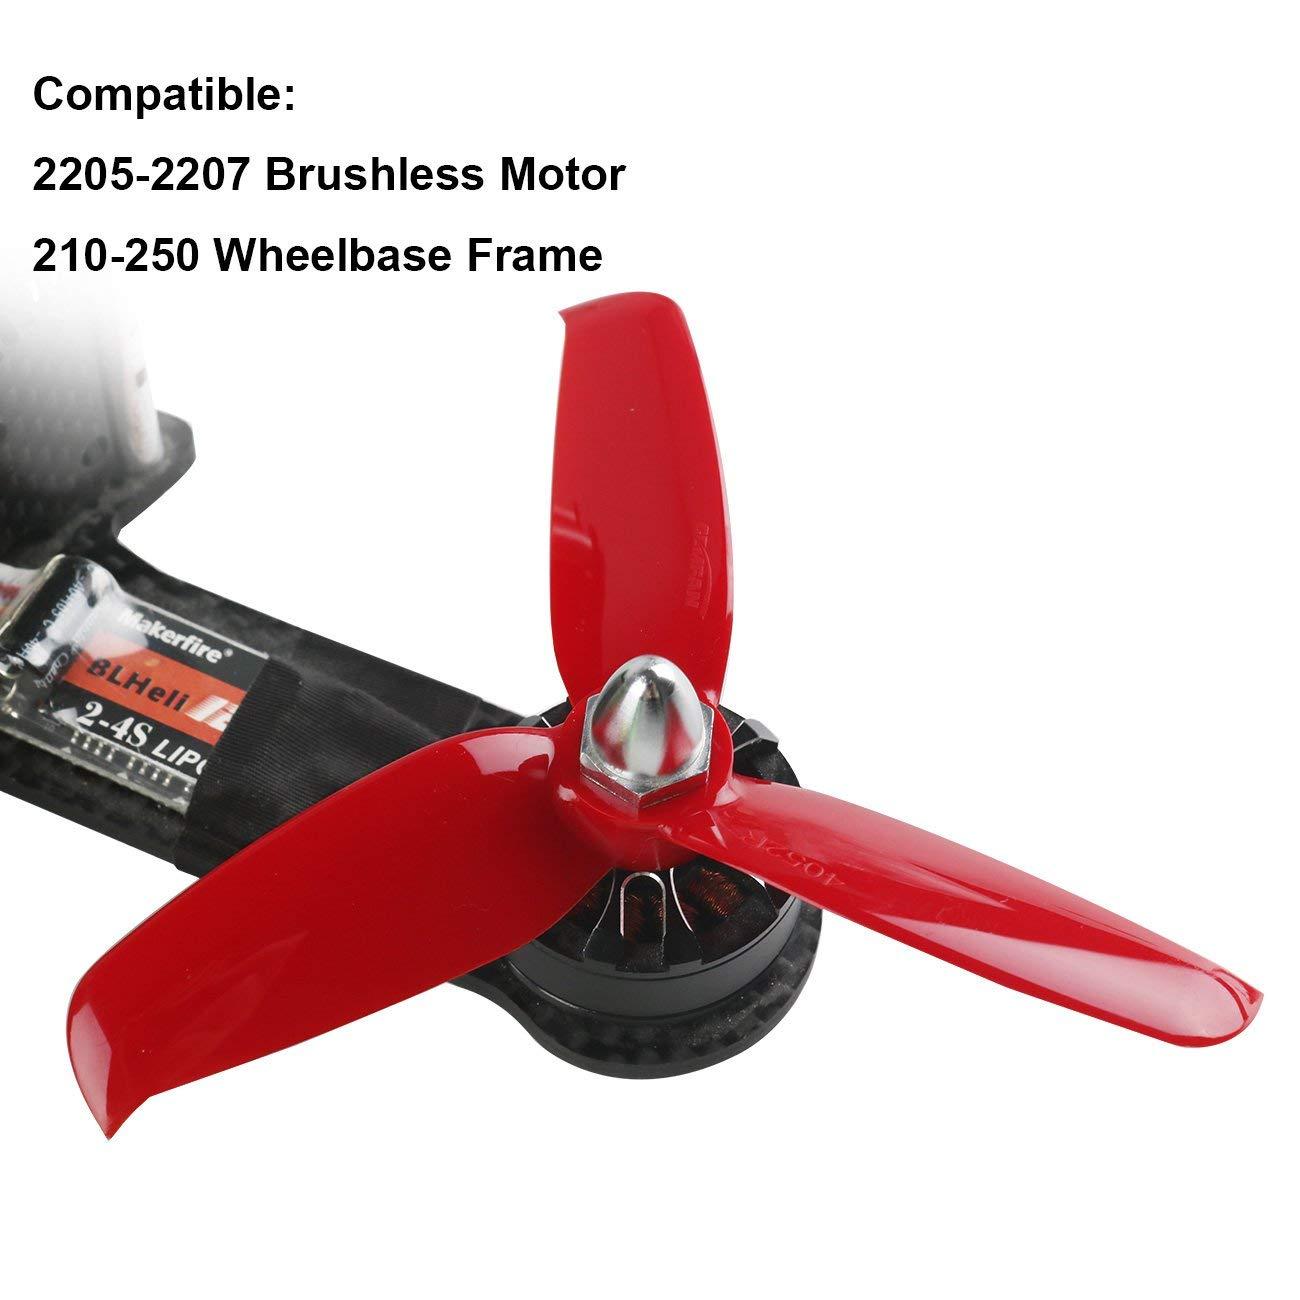 Orange HD 4052(40X5.2) Tri Blade Flash Propellers 2CW+2CCW 2 Pair-Ferrari Red